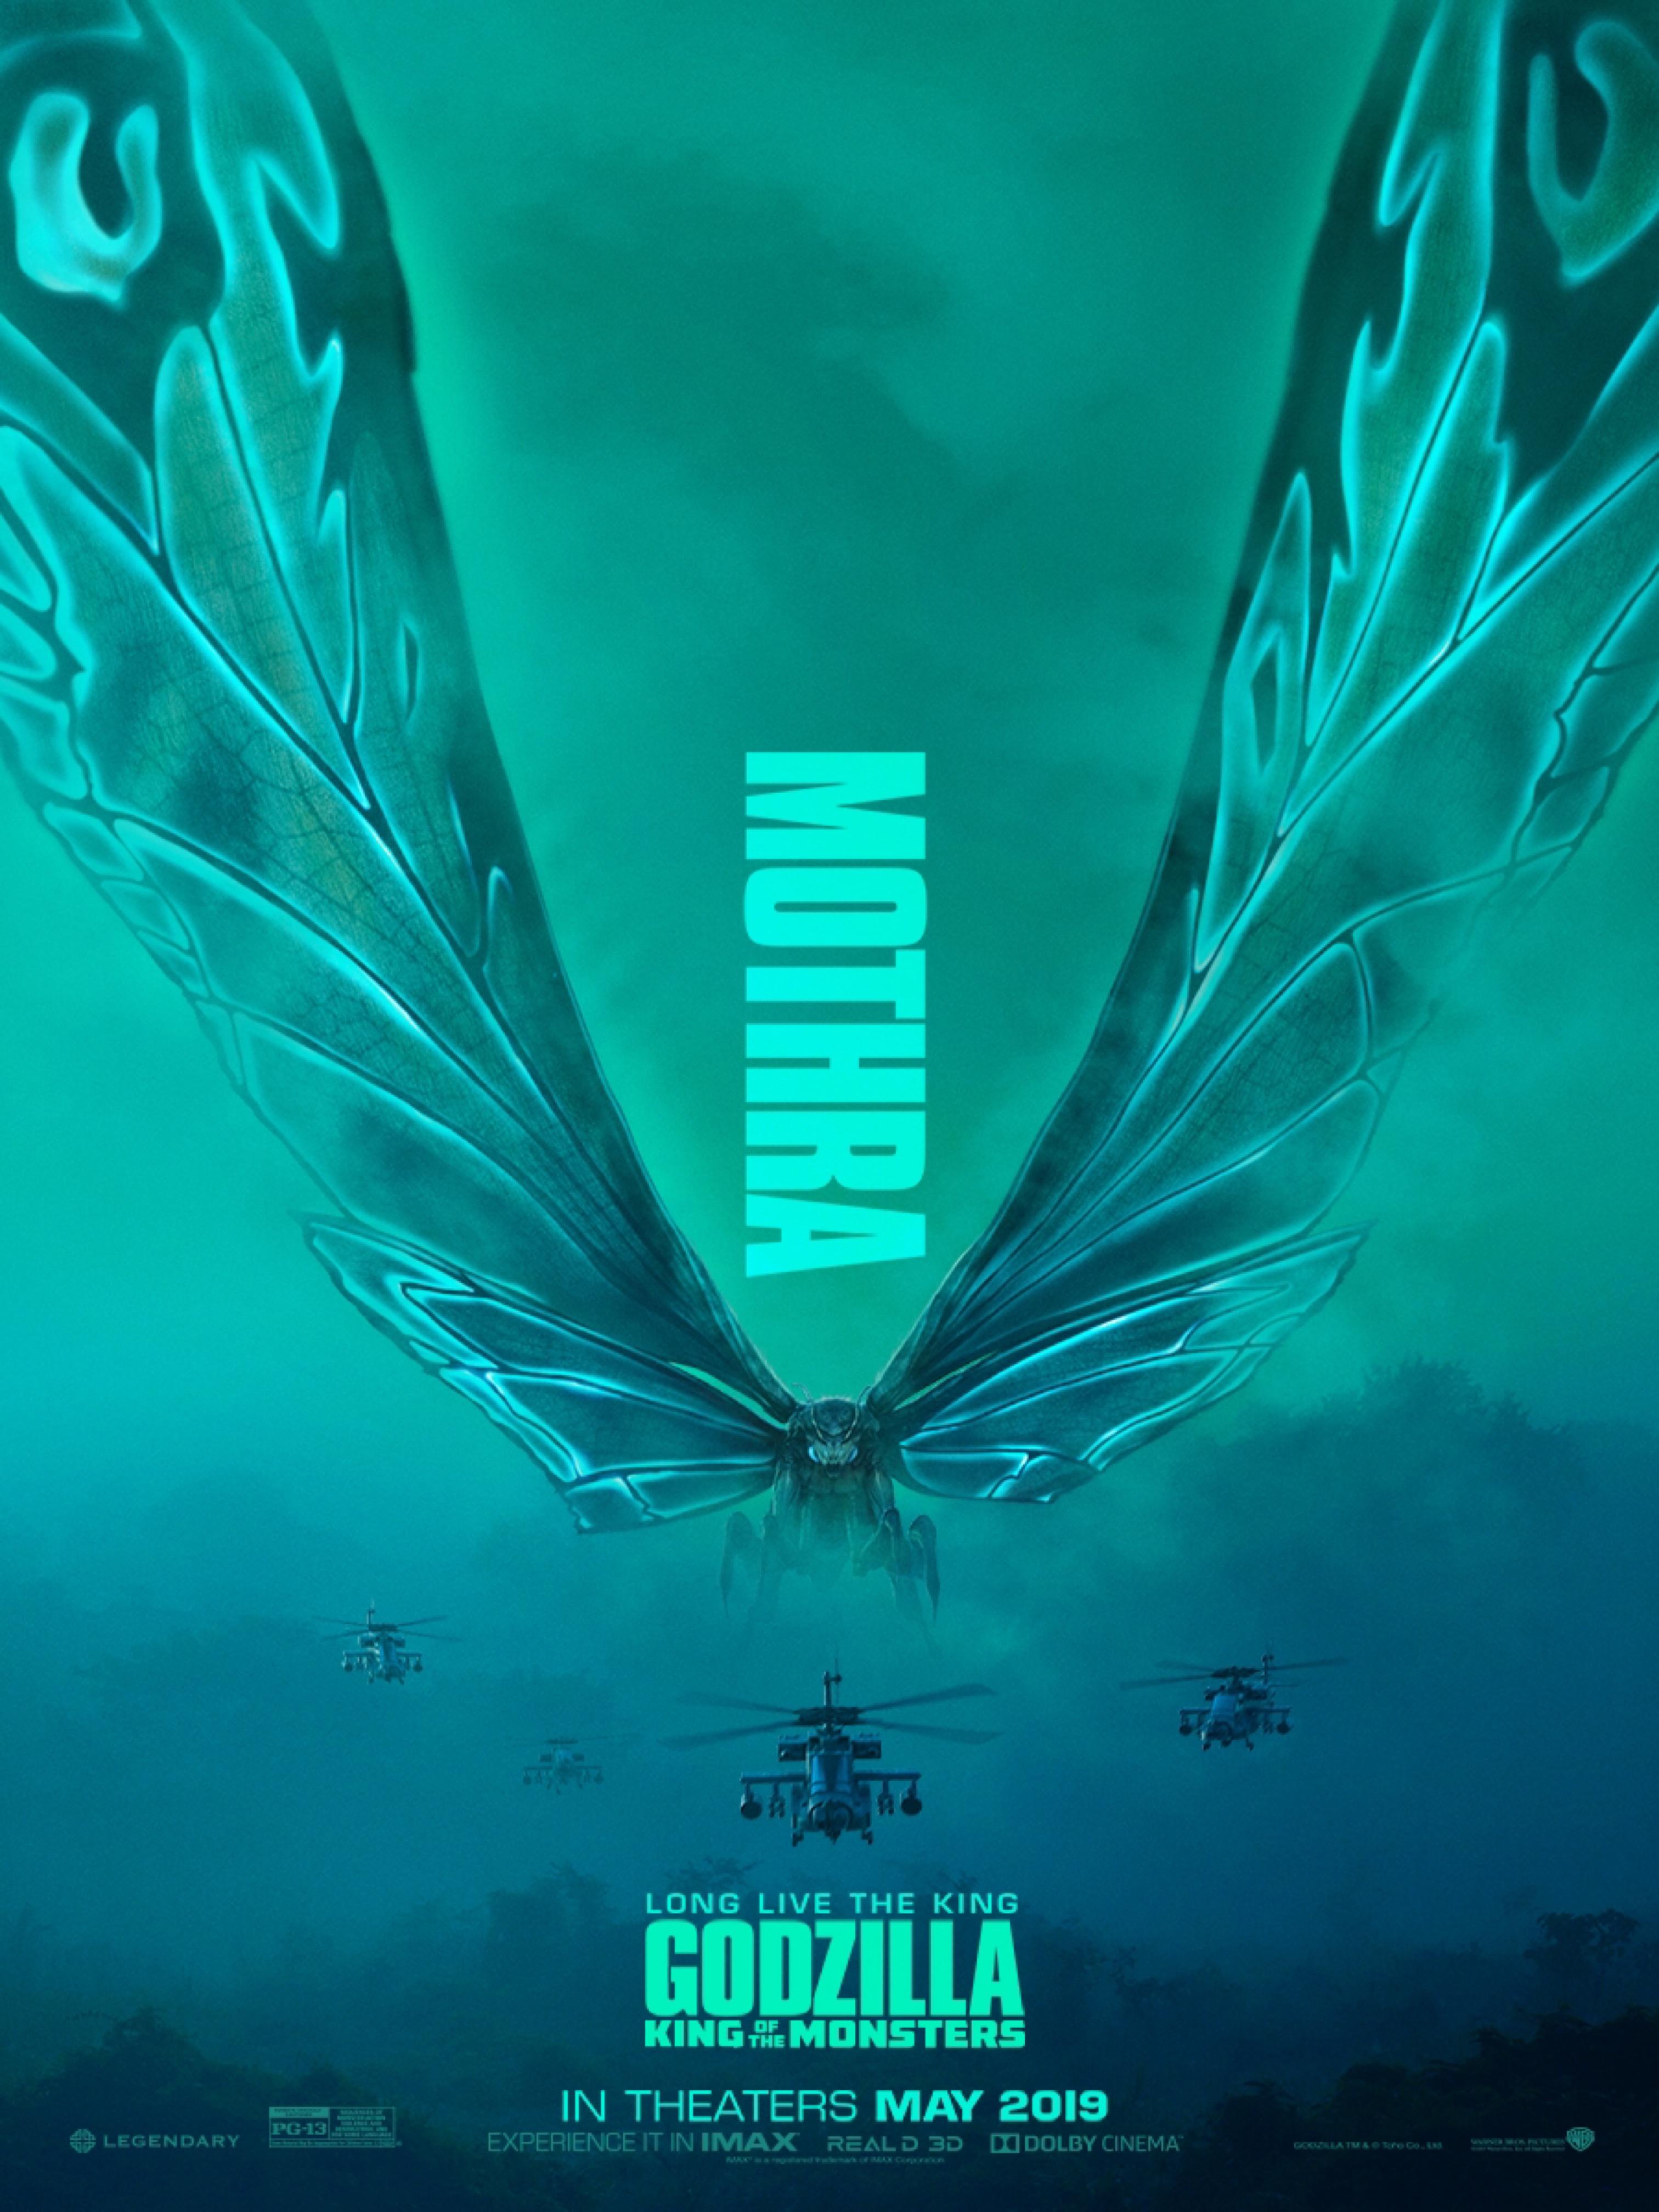 movie poster design 2 Godzilla official